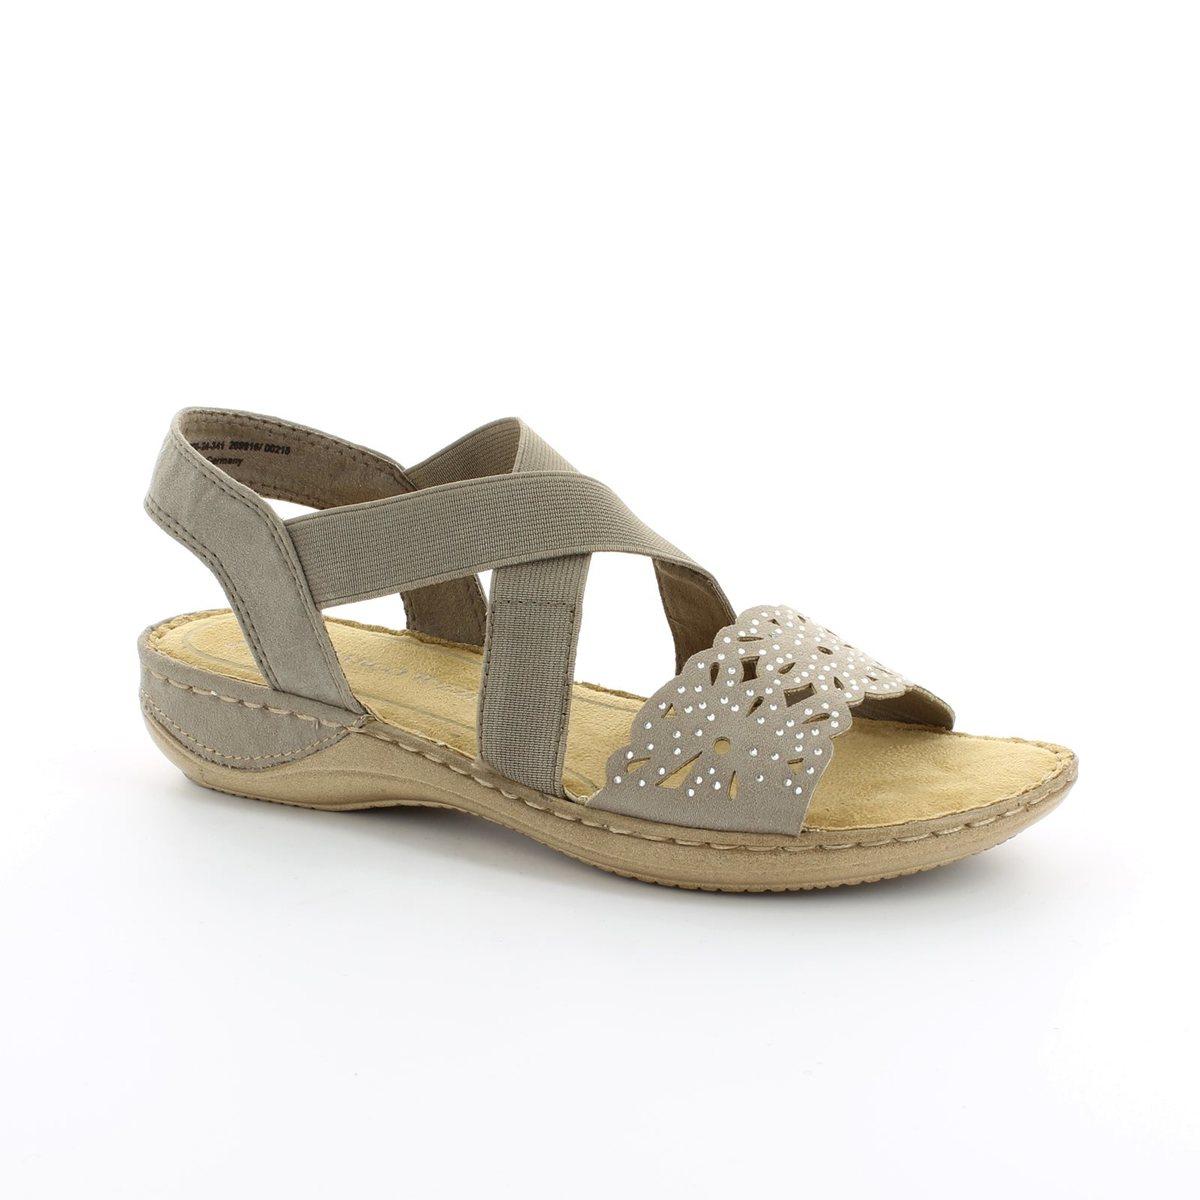 marco tozzi tango 28800 341 taupe sandals. Black Bedroom Furniture Sets. Home Design Ideas